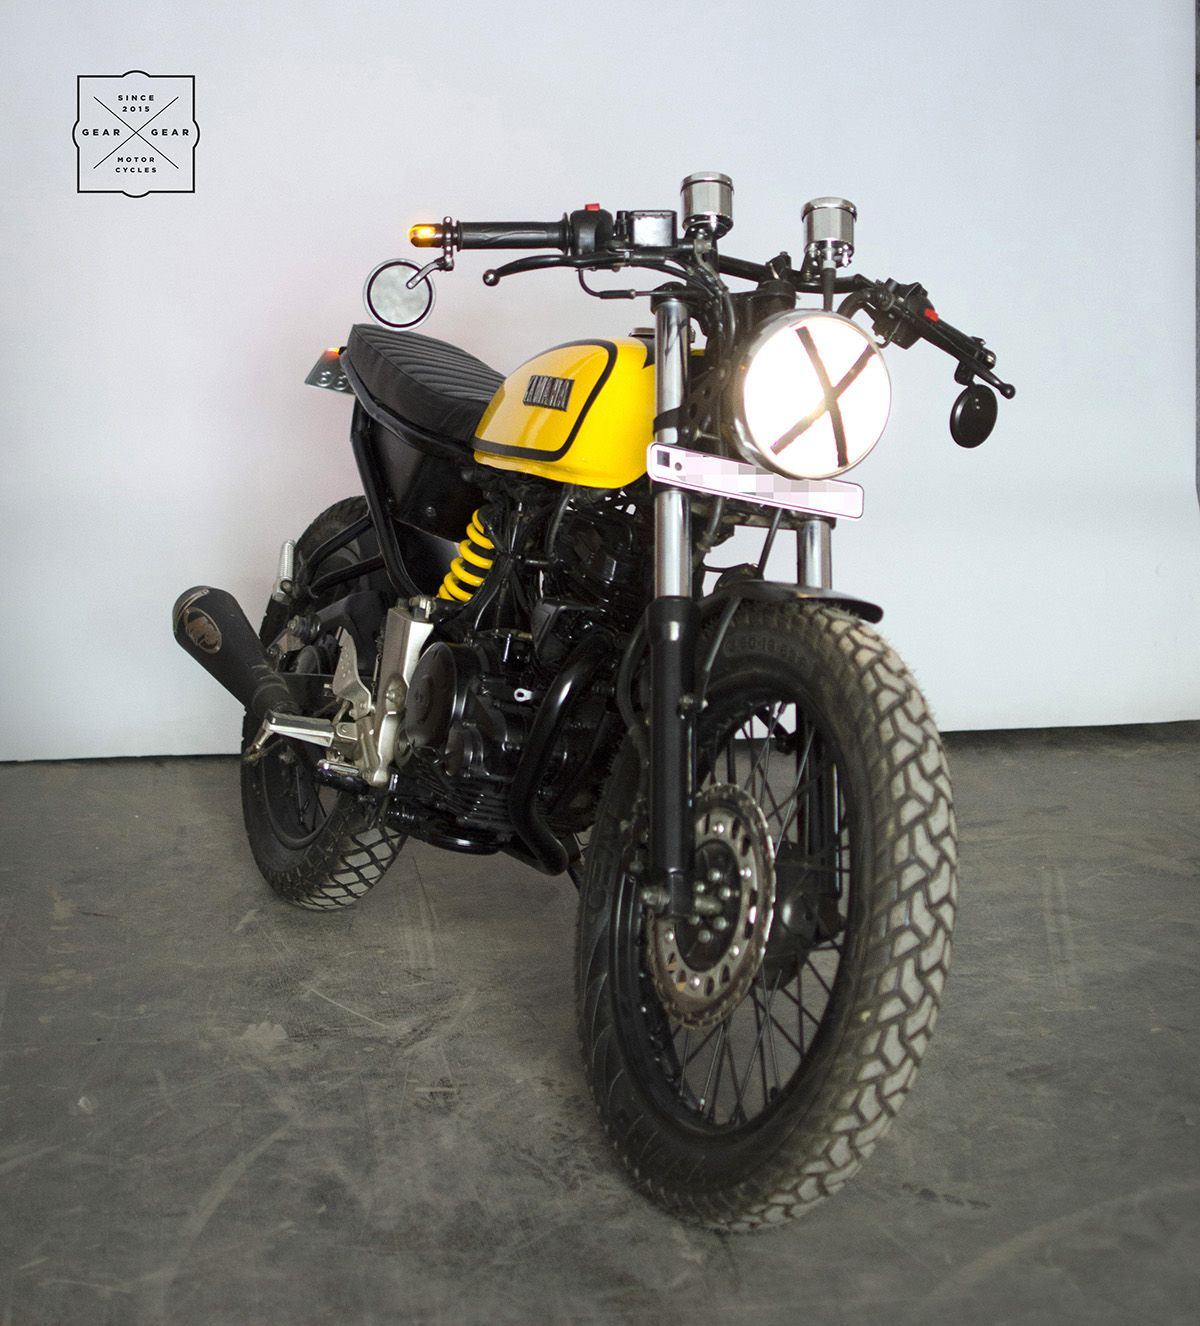 Yamaha Fz Modified Into A Yamaha Rx100 By Gear Gear Motorcycles